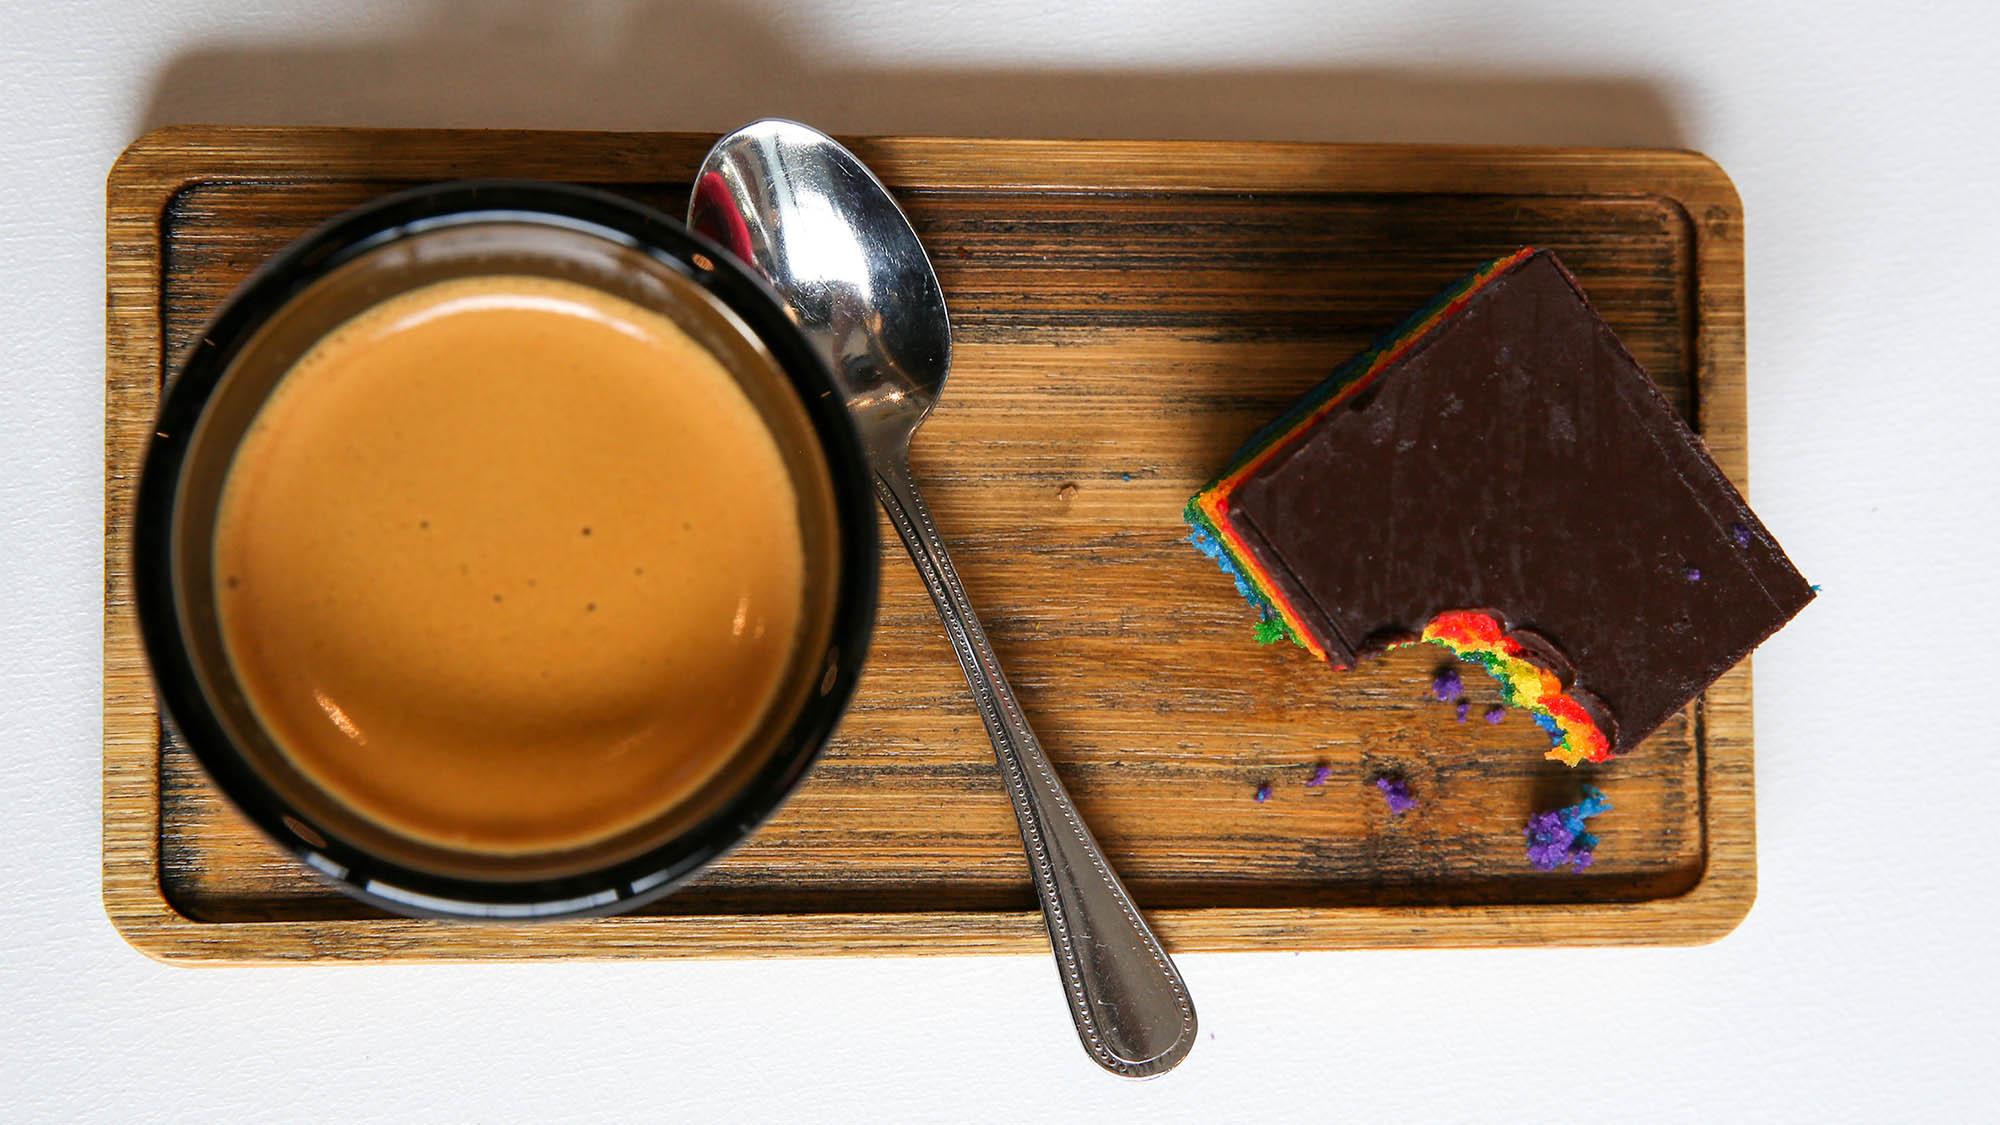 Rainbow Cake and Tea